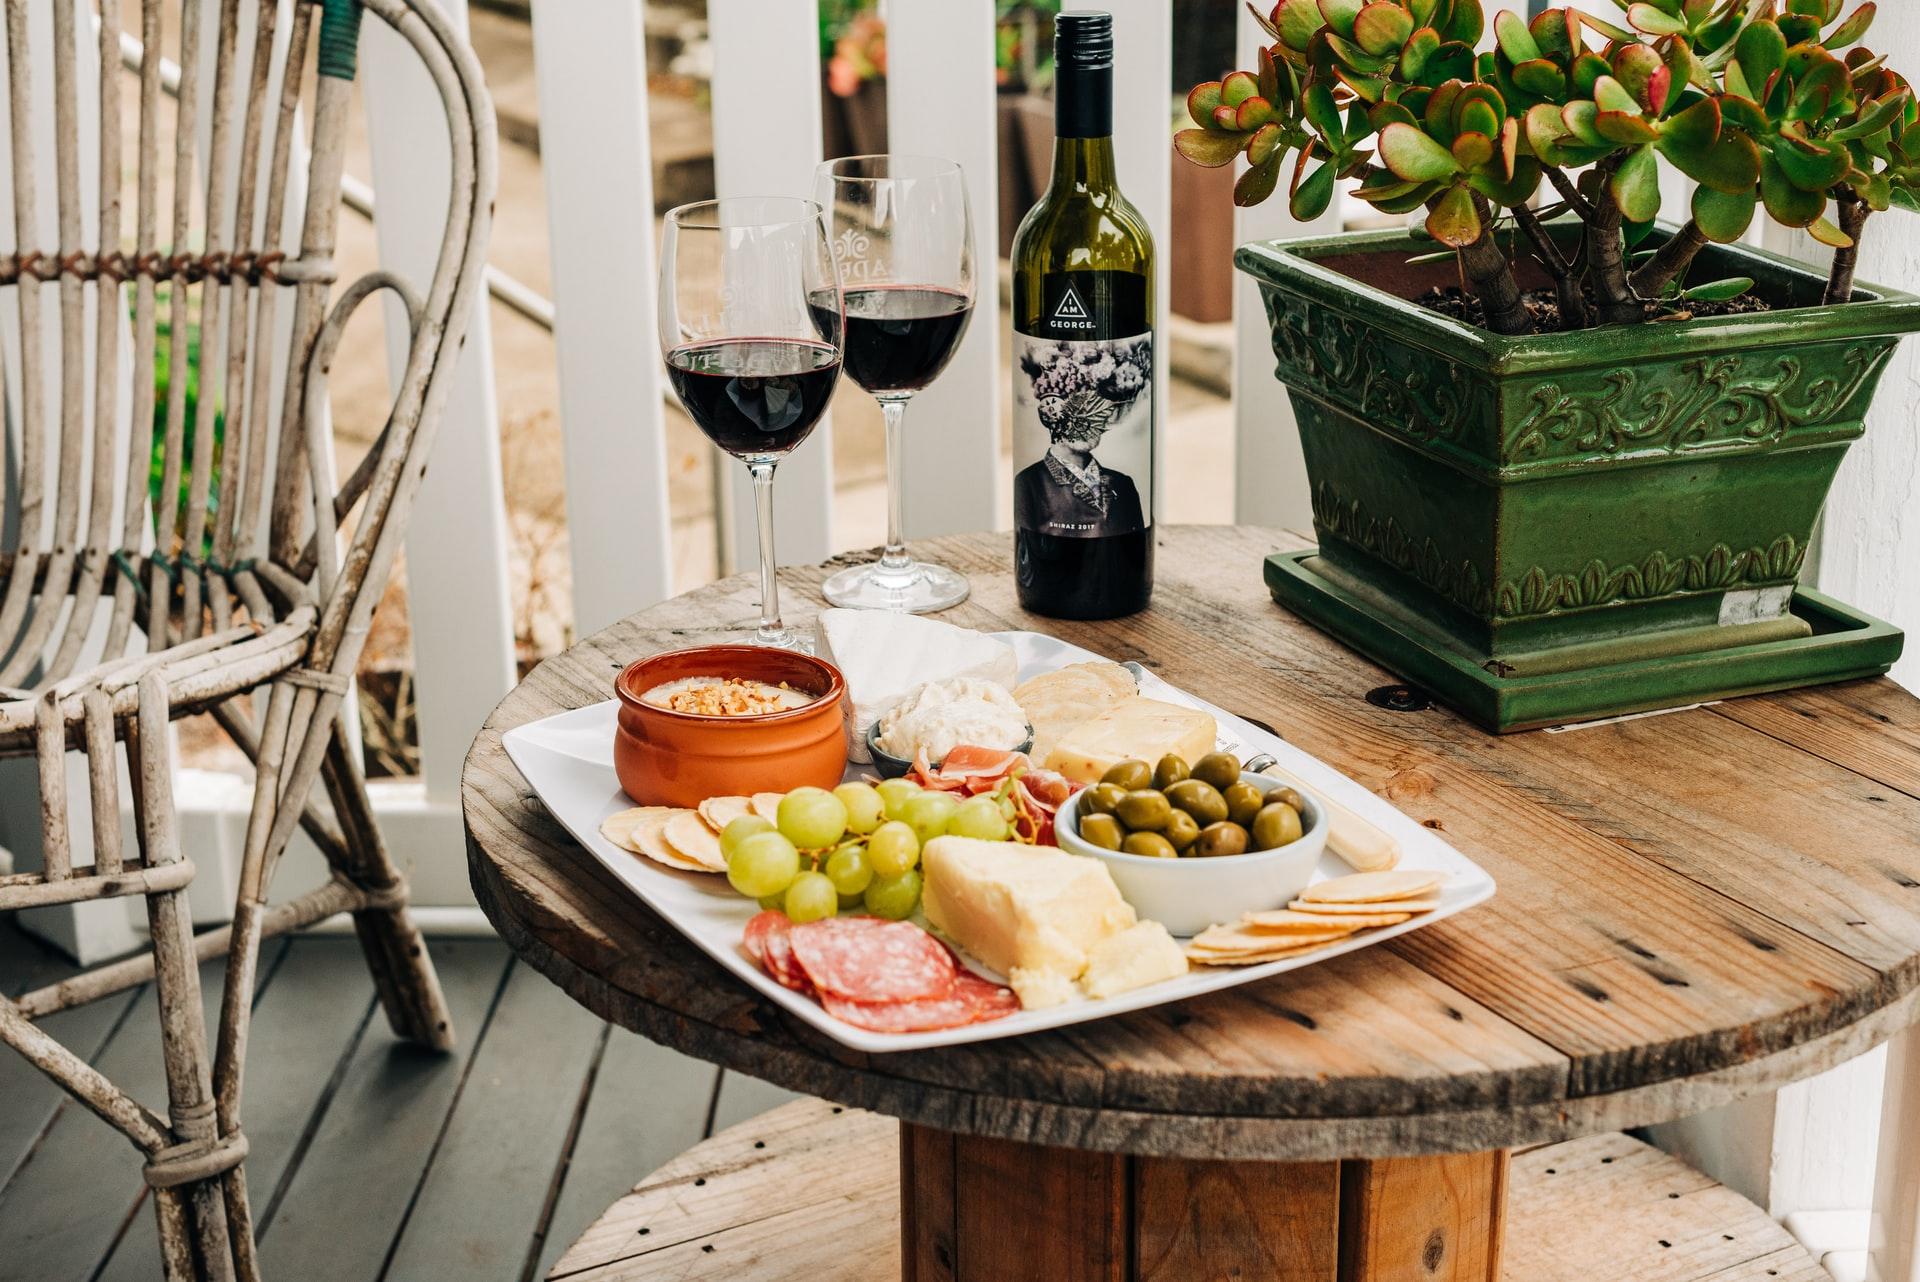 55 Great Walk-In Restaurants With Outdoor Seating